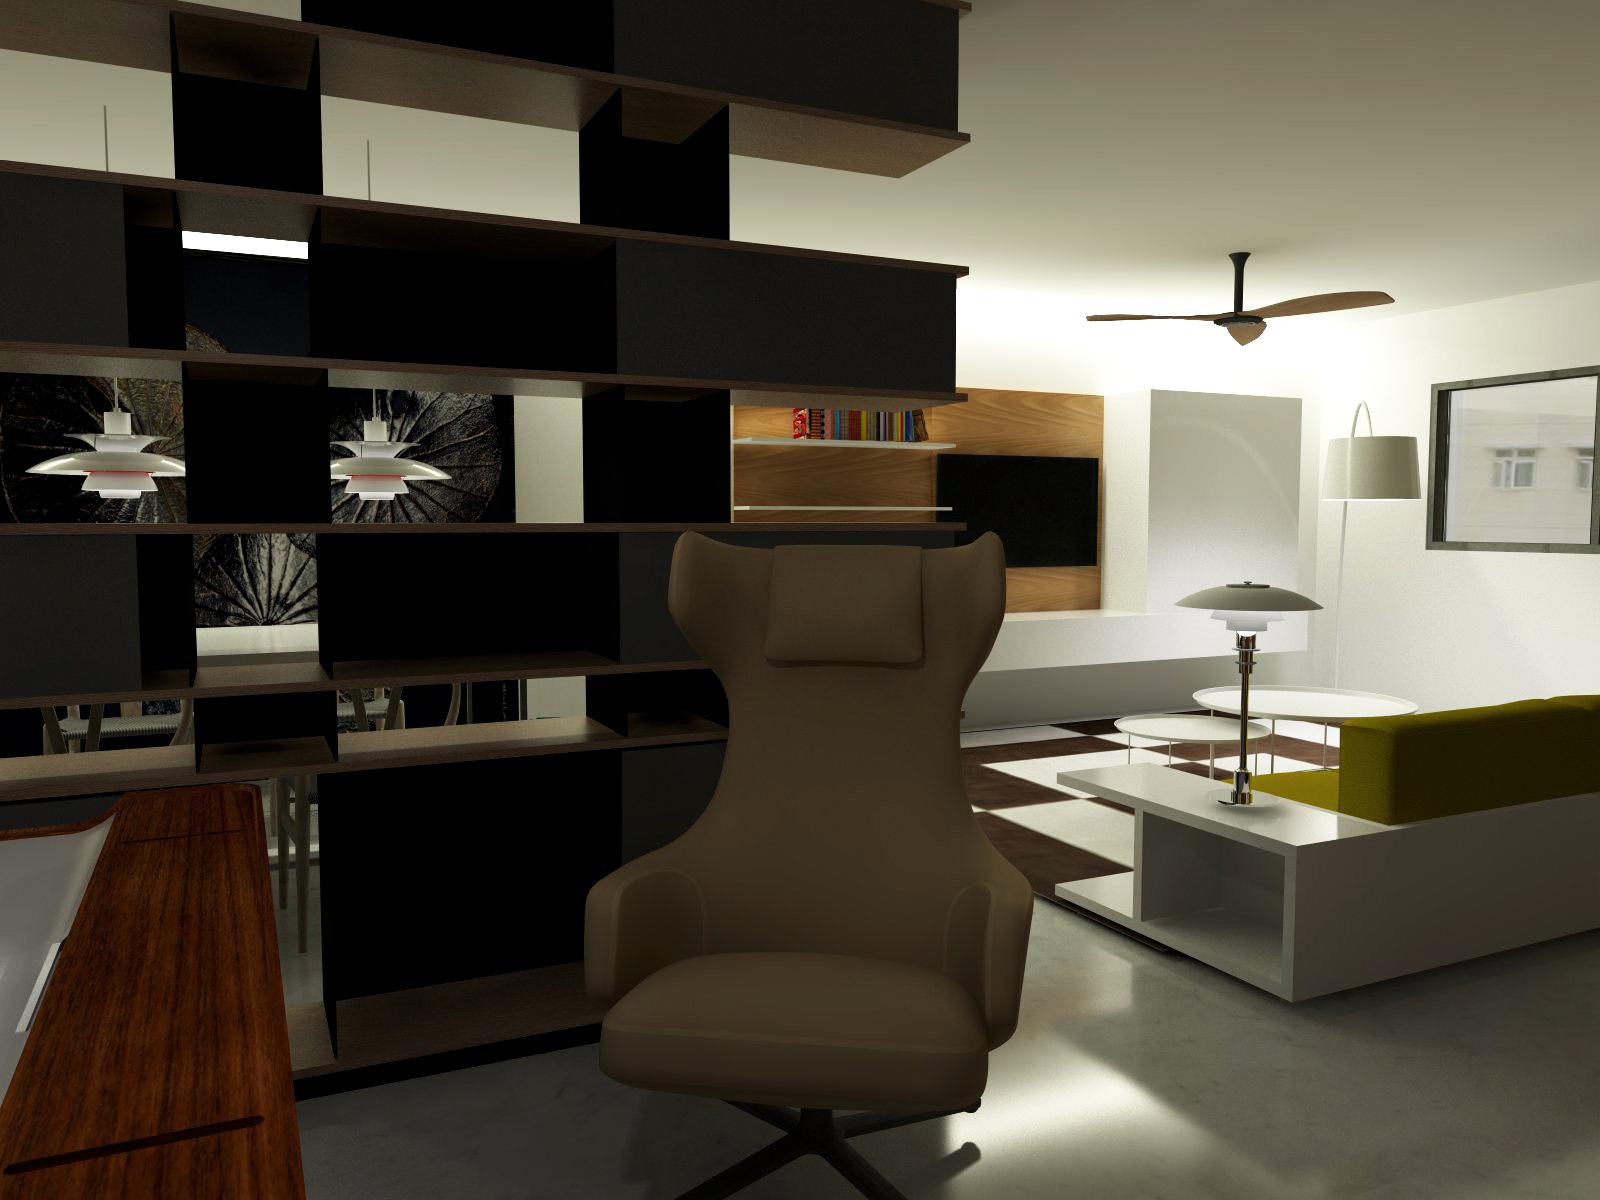 Designfantastico Mcnair Road 4 Room Hdb